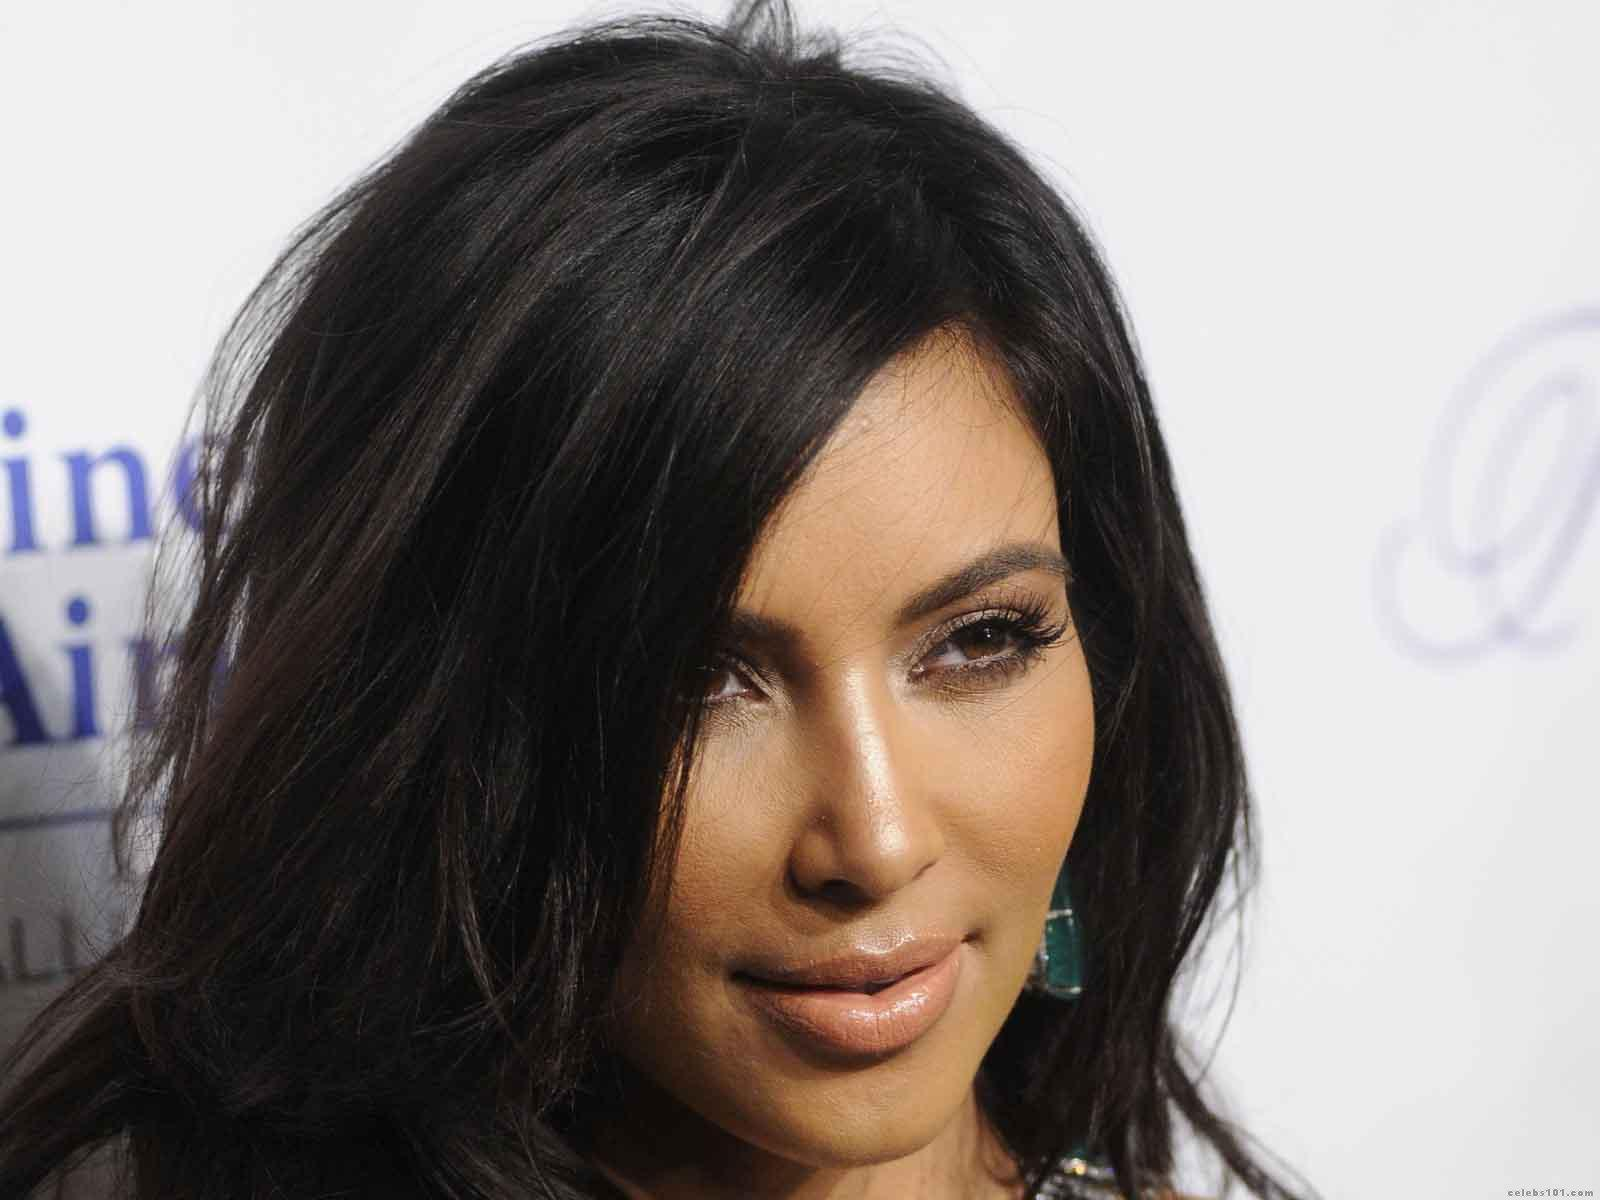 Kim Kardashian Wallpaperjpg 1600x1200